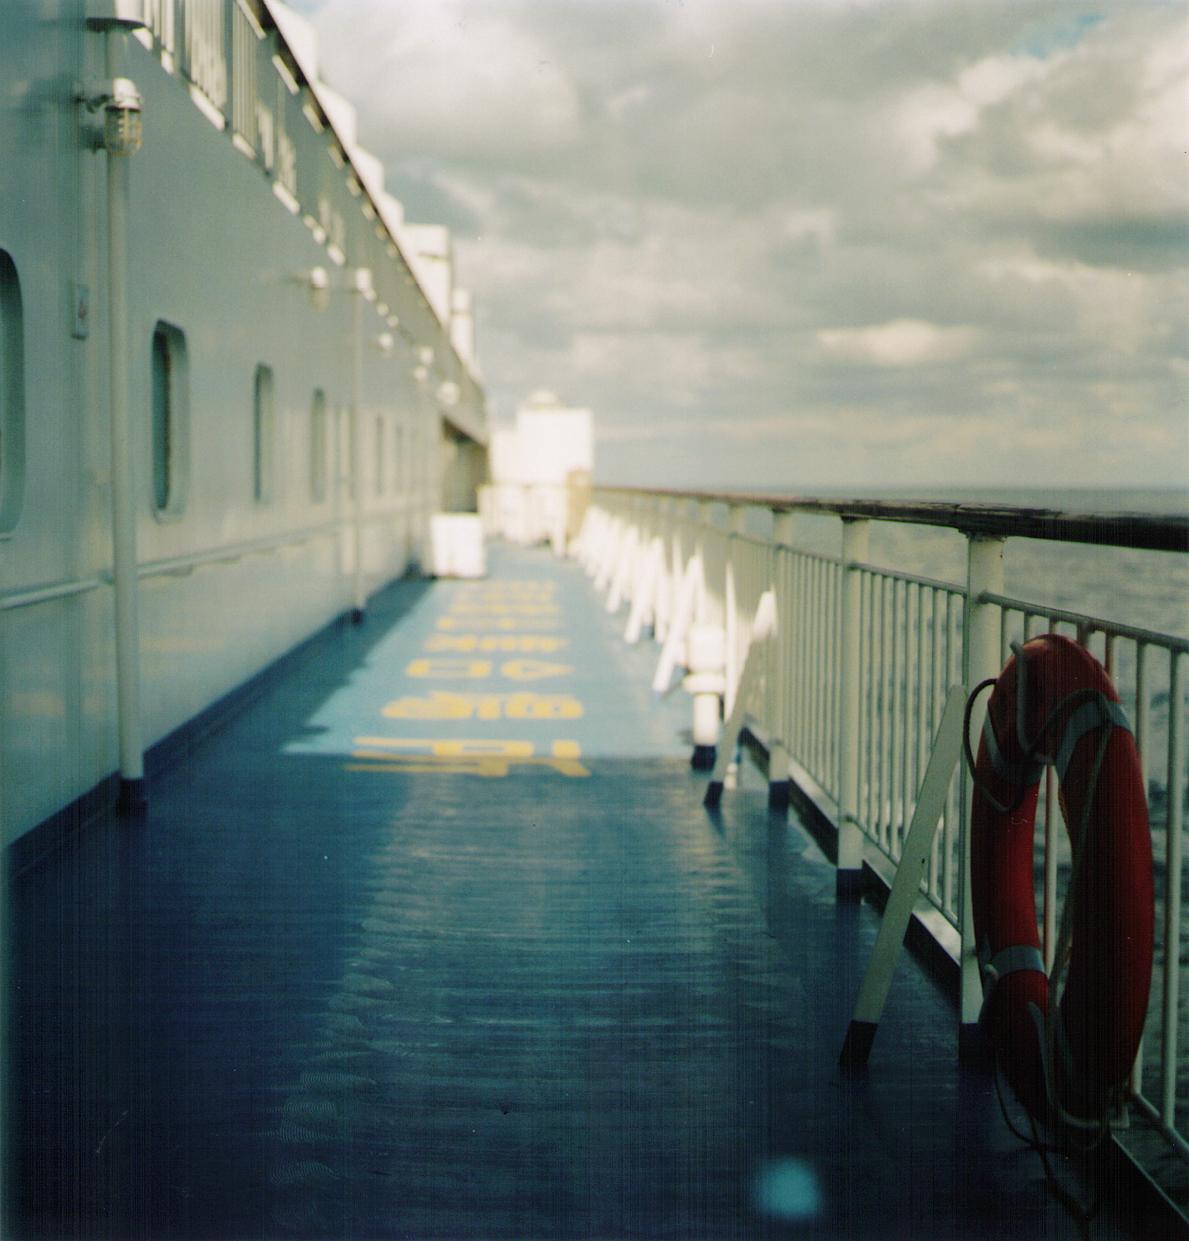 on ship